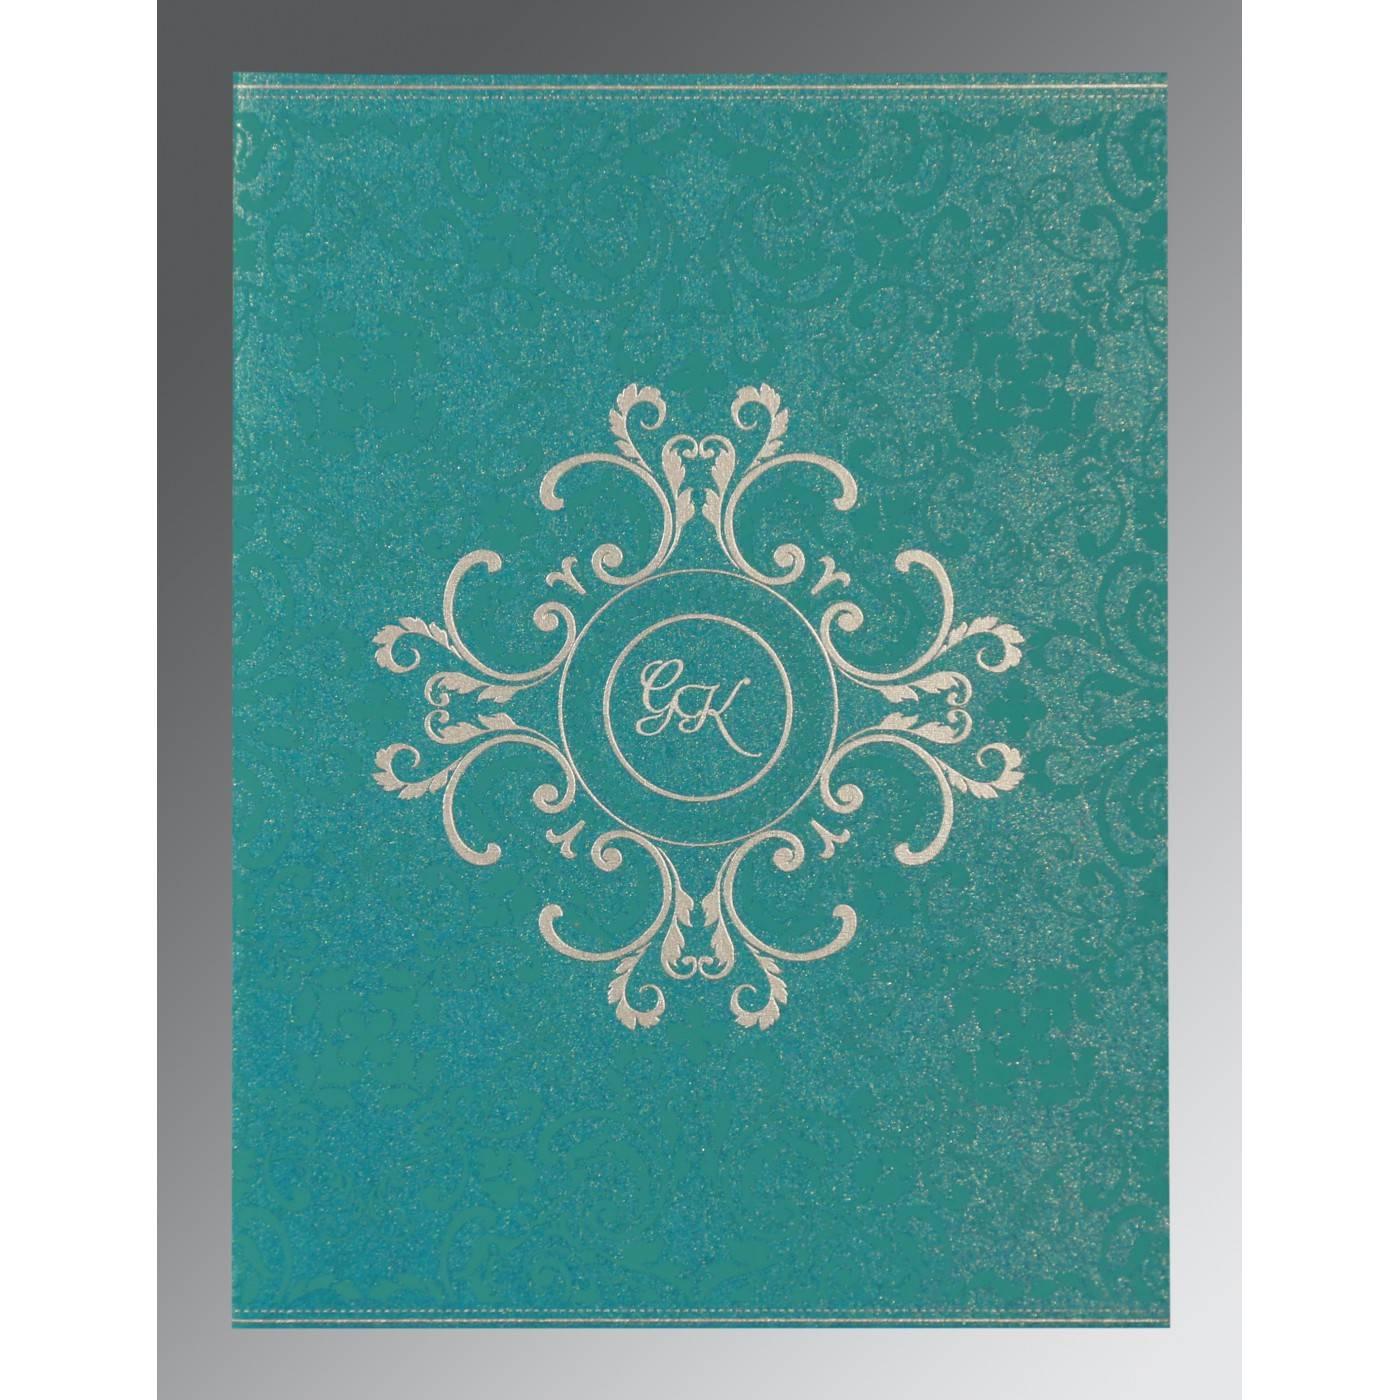 TEAL BLUE SHIMMERY SCREEN PRINTED WEDDING CARD : CS-8244C - IndianWeddingCards